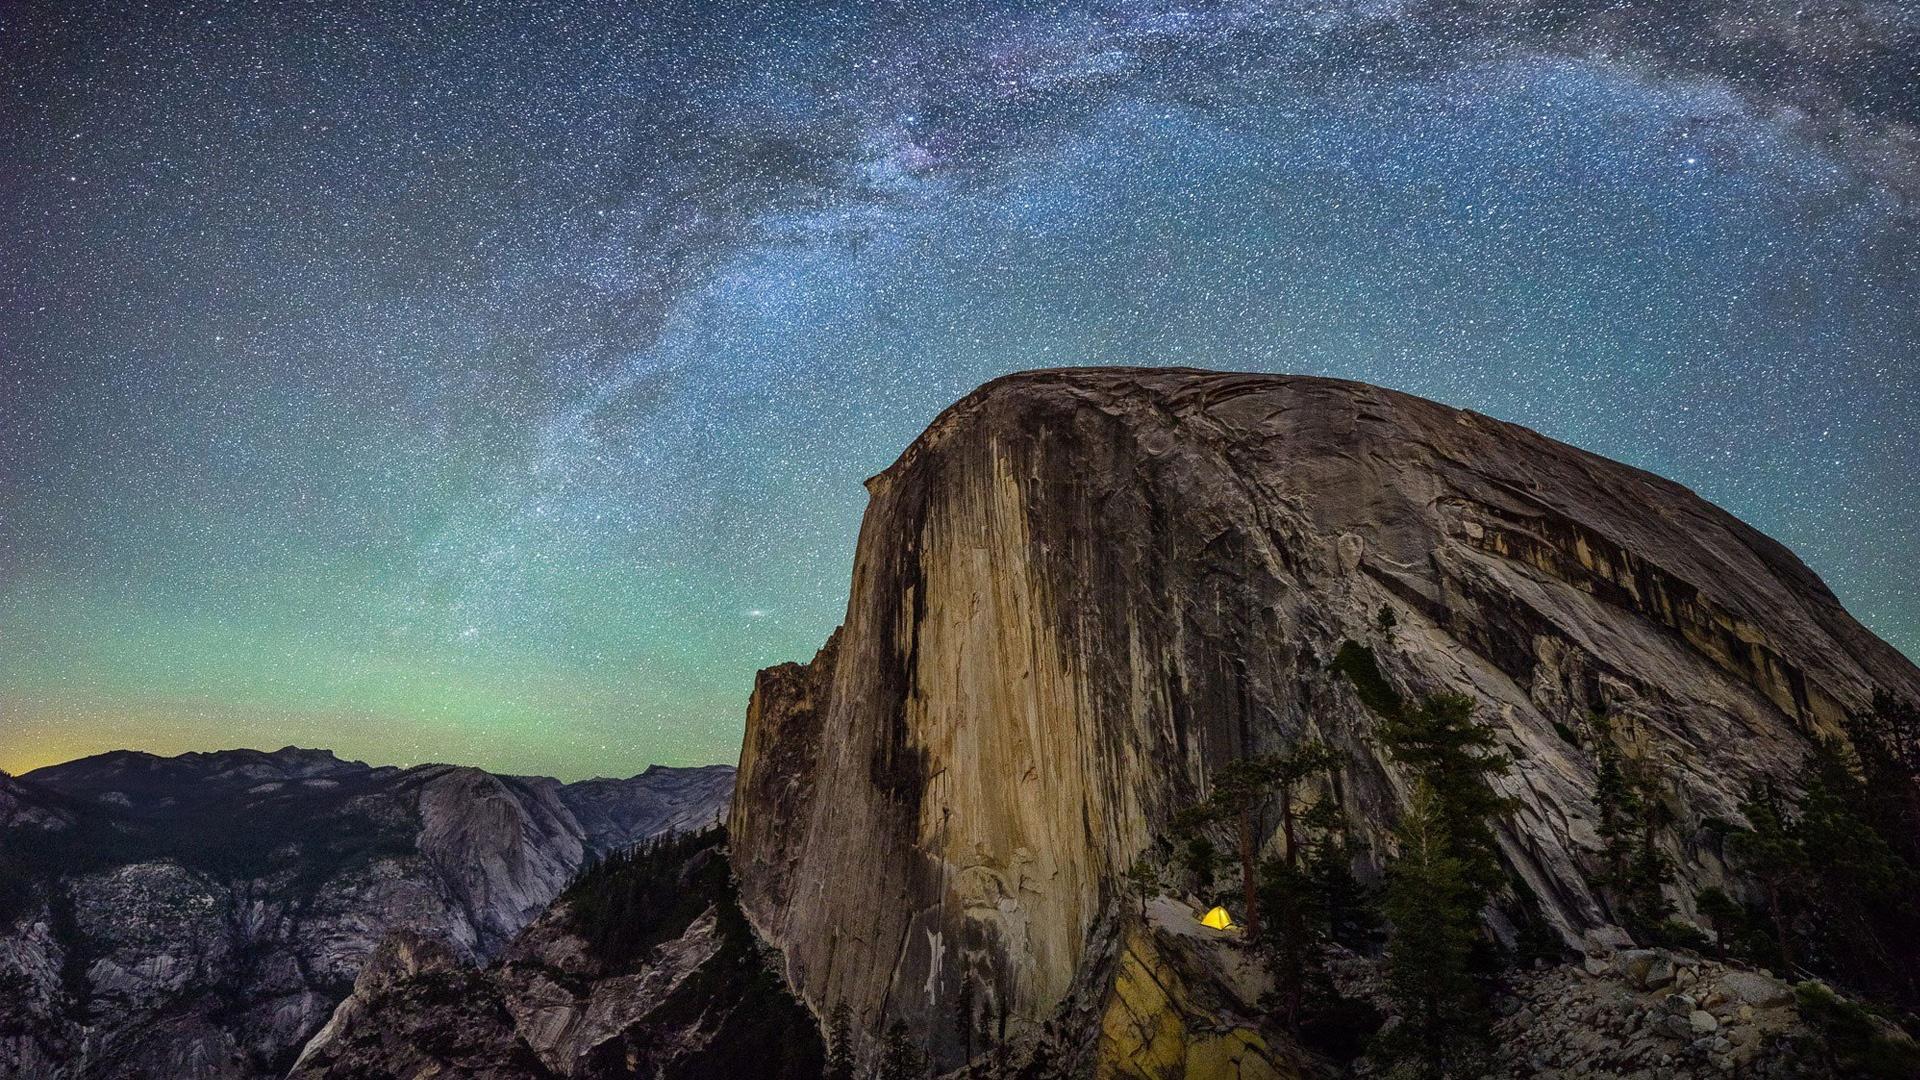 Yosemite Wallpapers HD 1920x1080